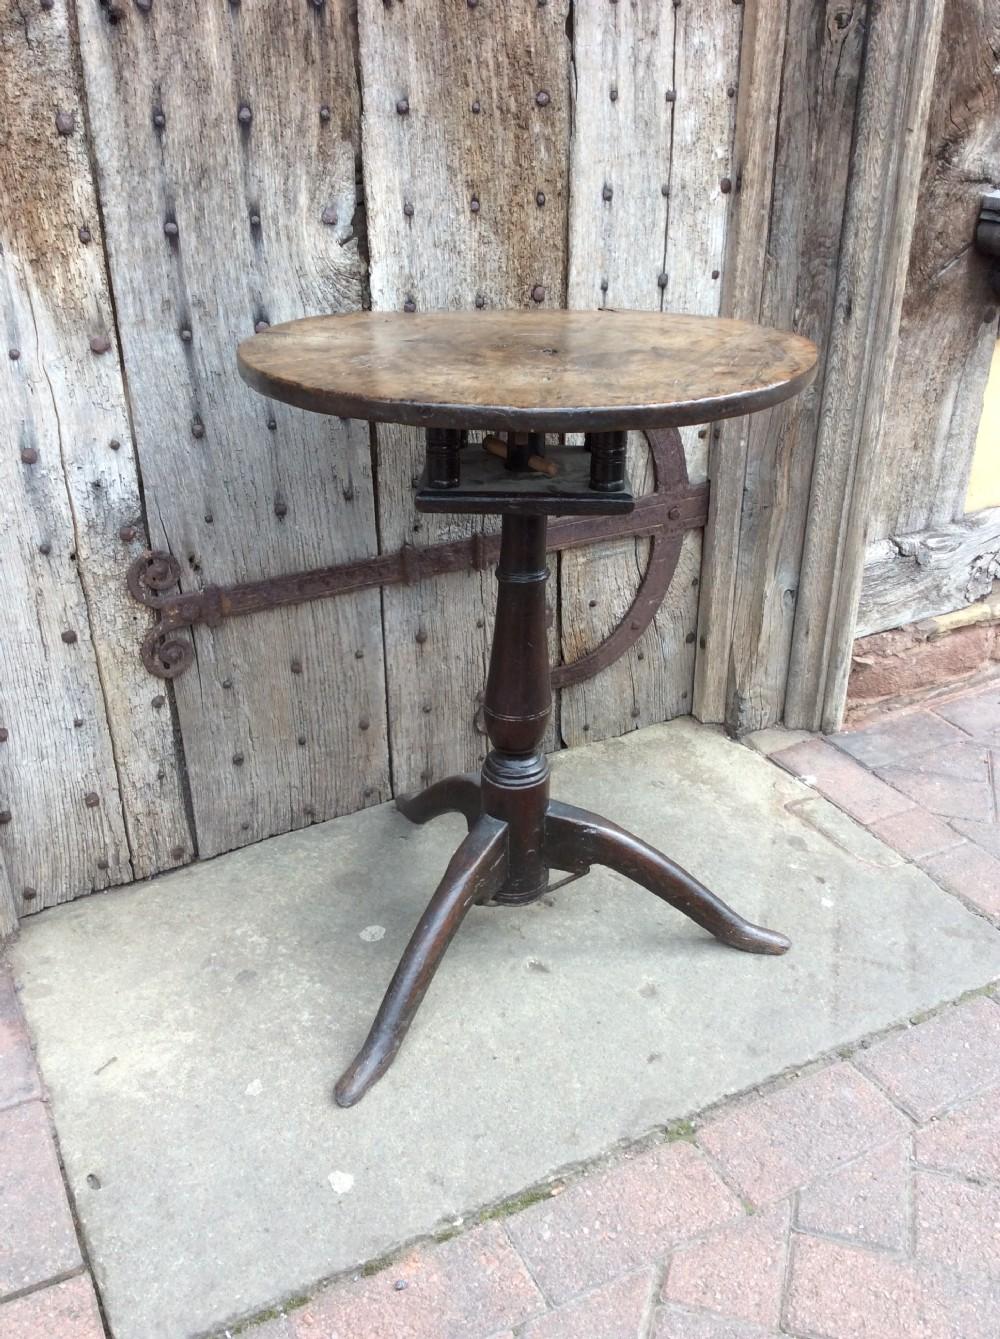 18thc oak primitive tripod table with birdcage